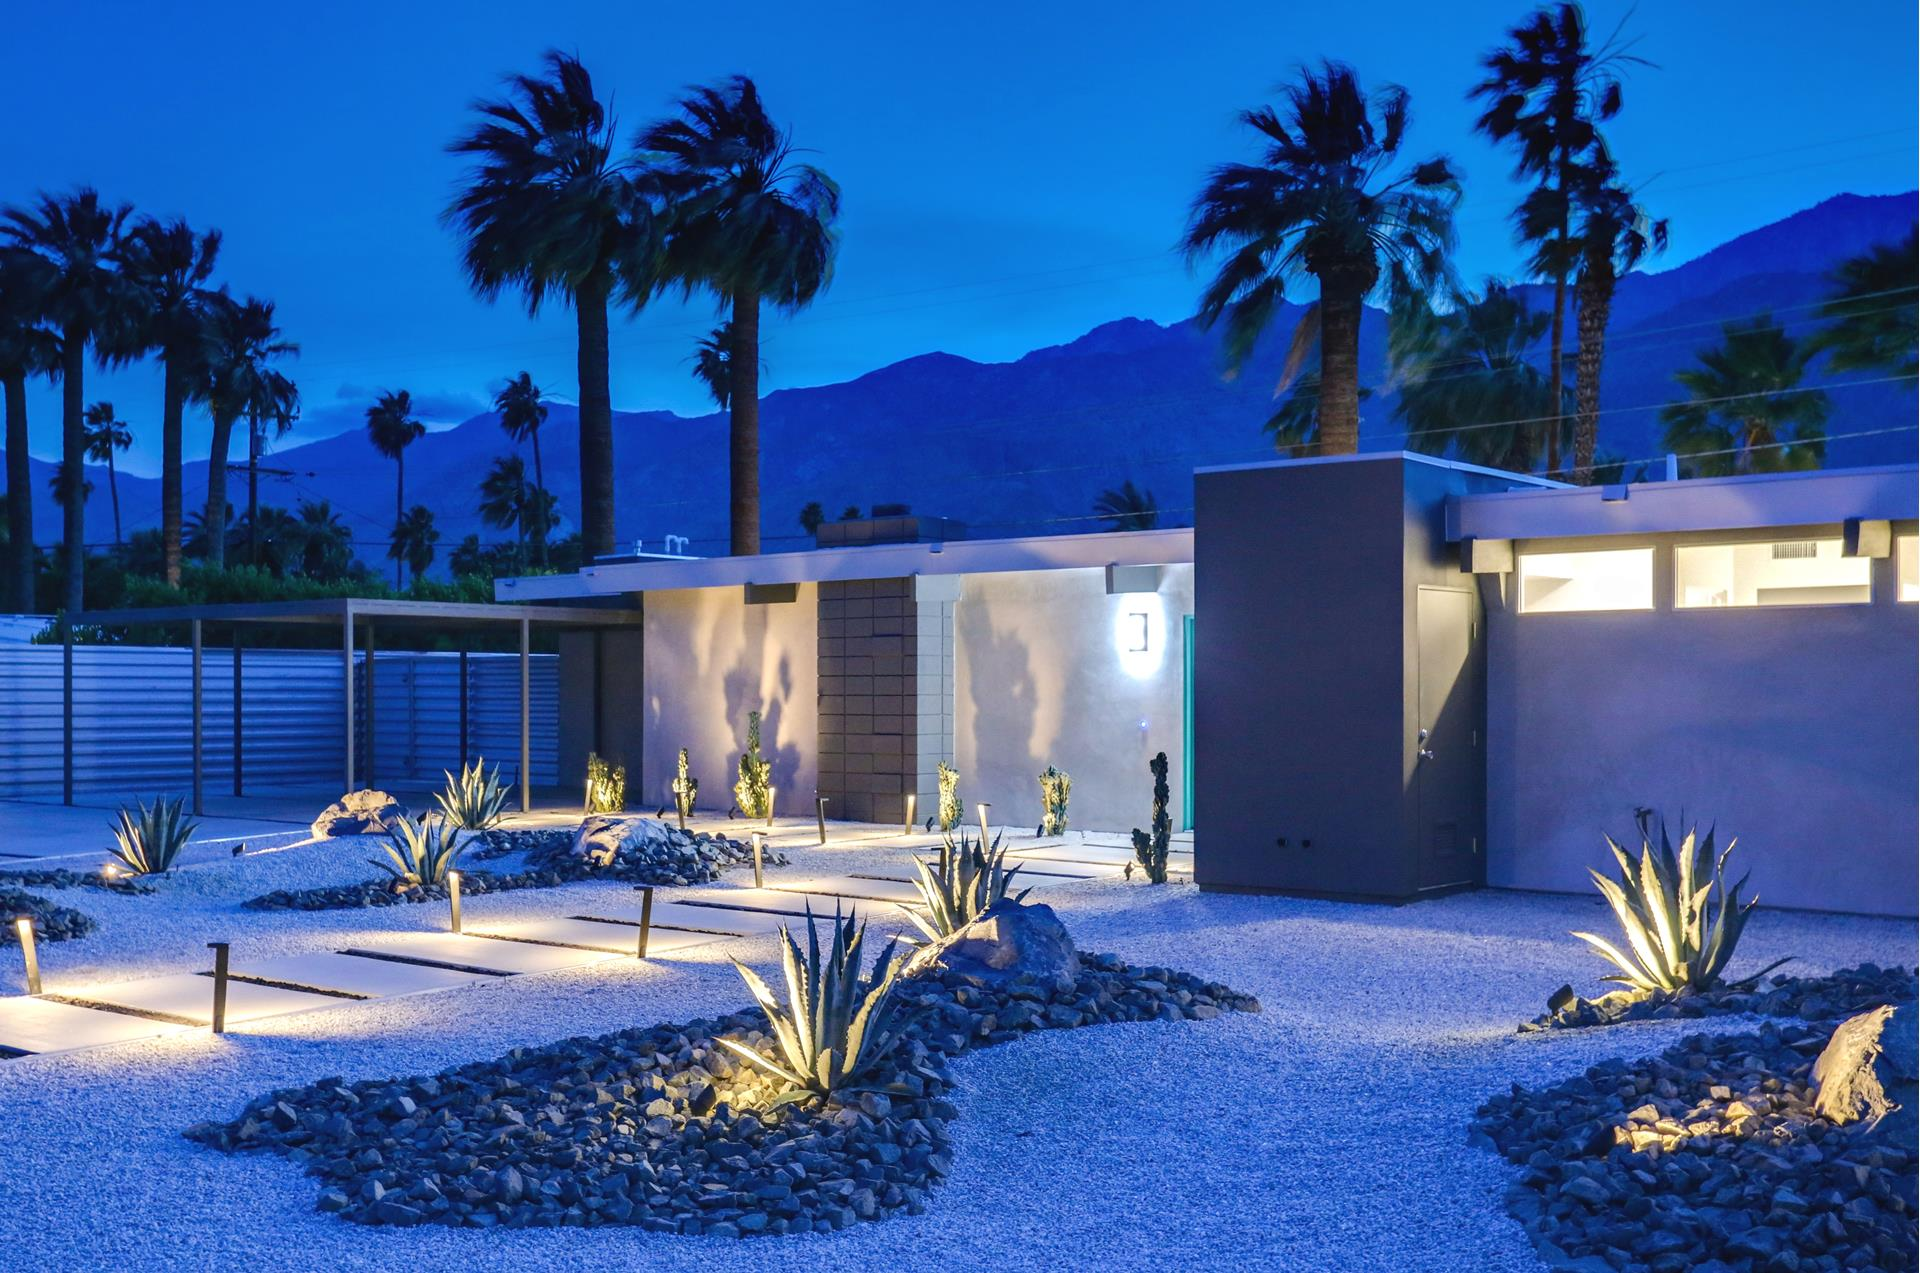 239 N BURTON Way - Palm Springs, California